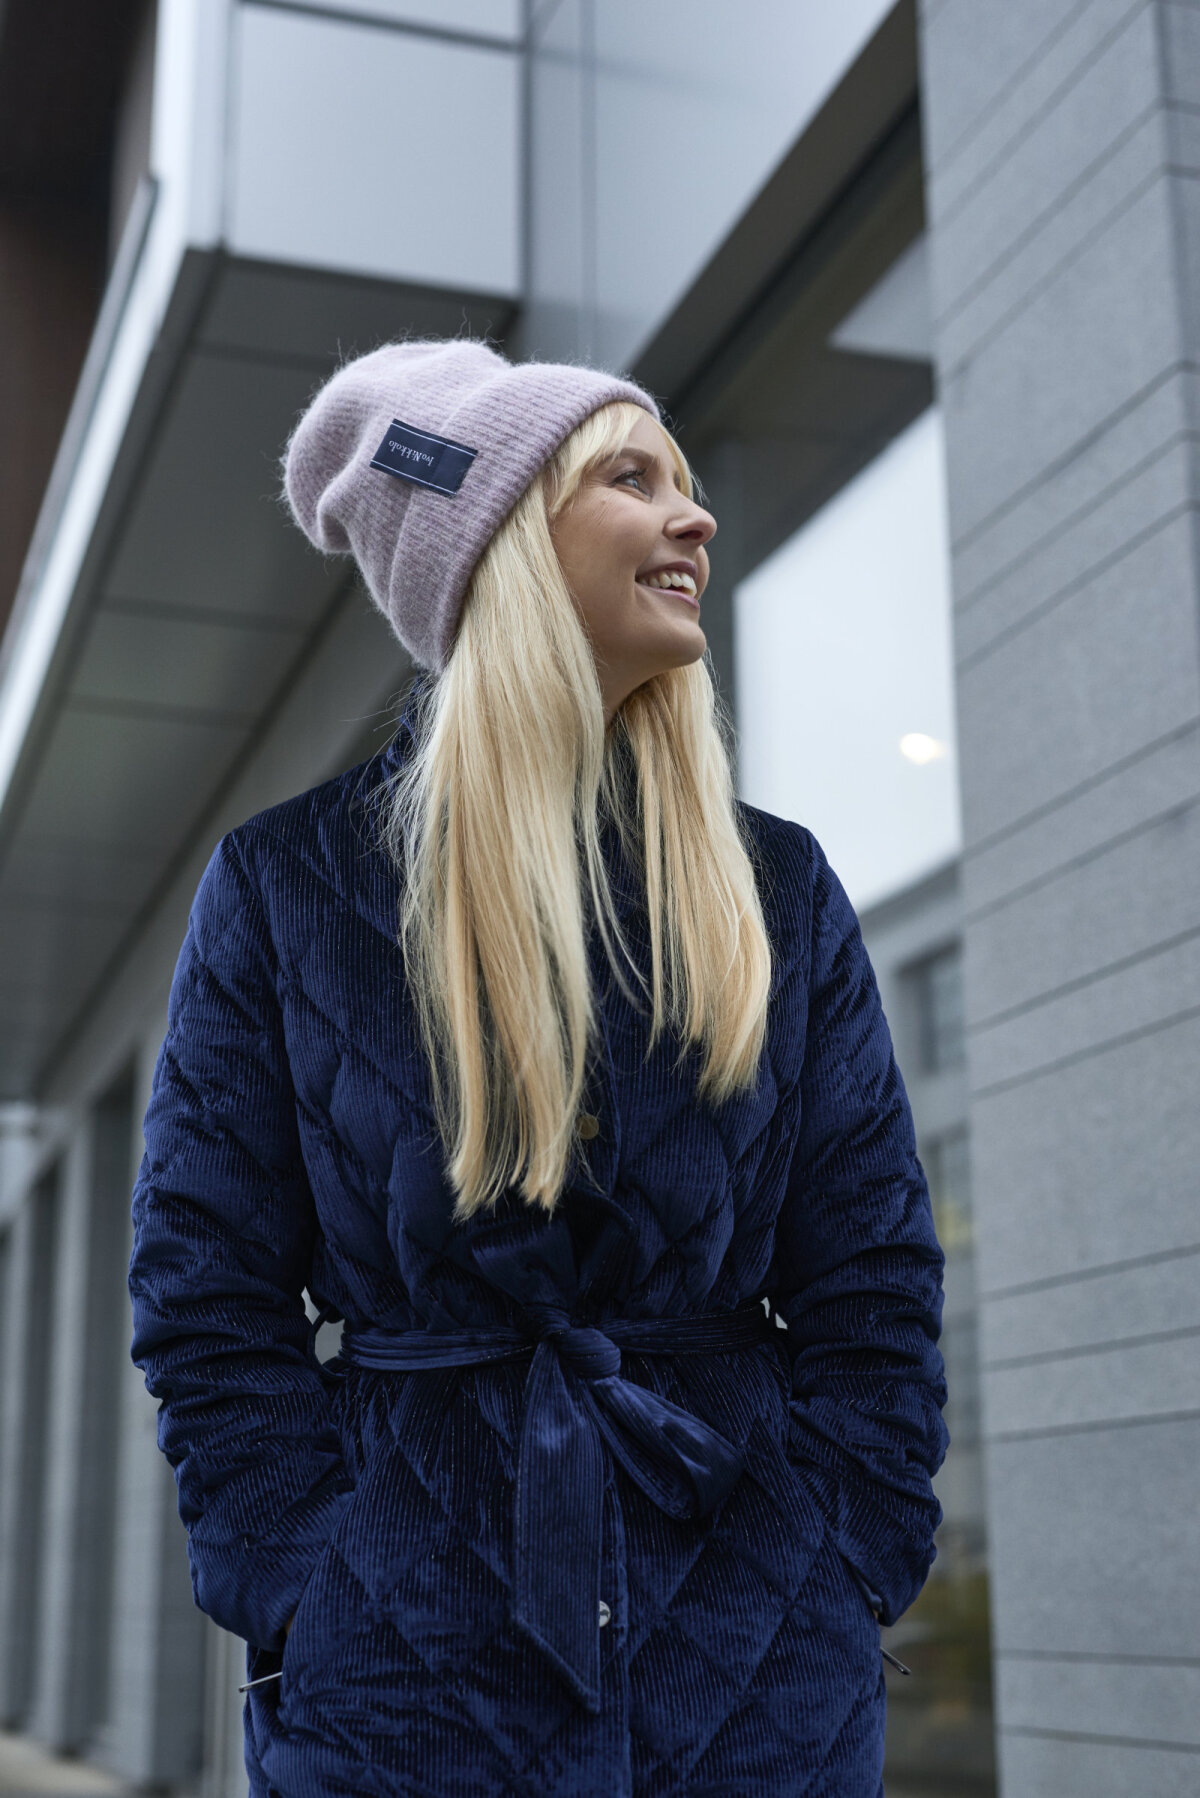 Ivo Nikkolo 25 X Piret Järvis-Milder